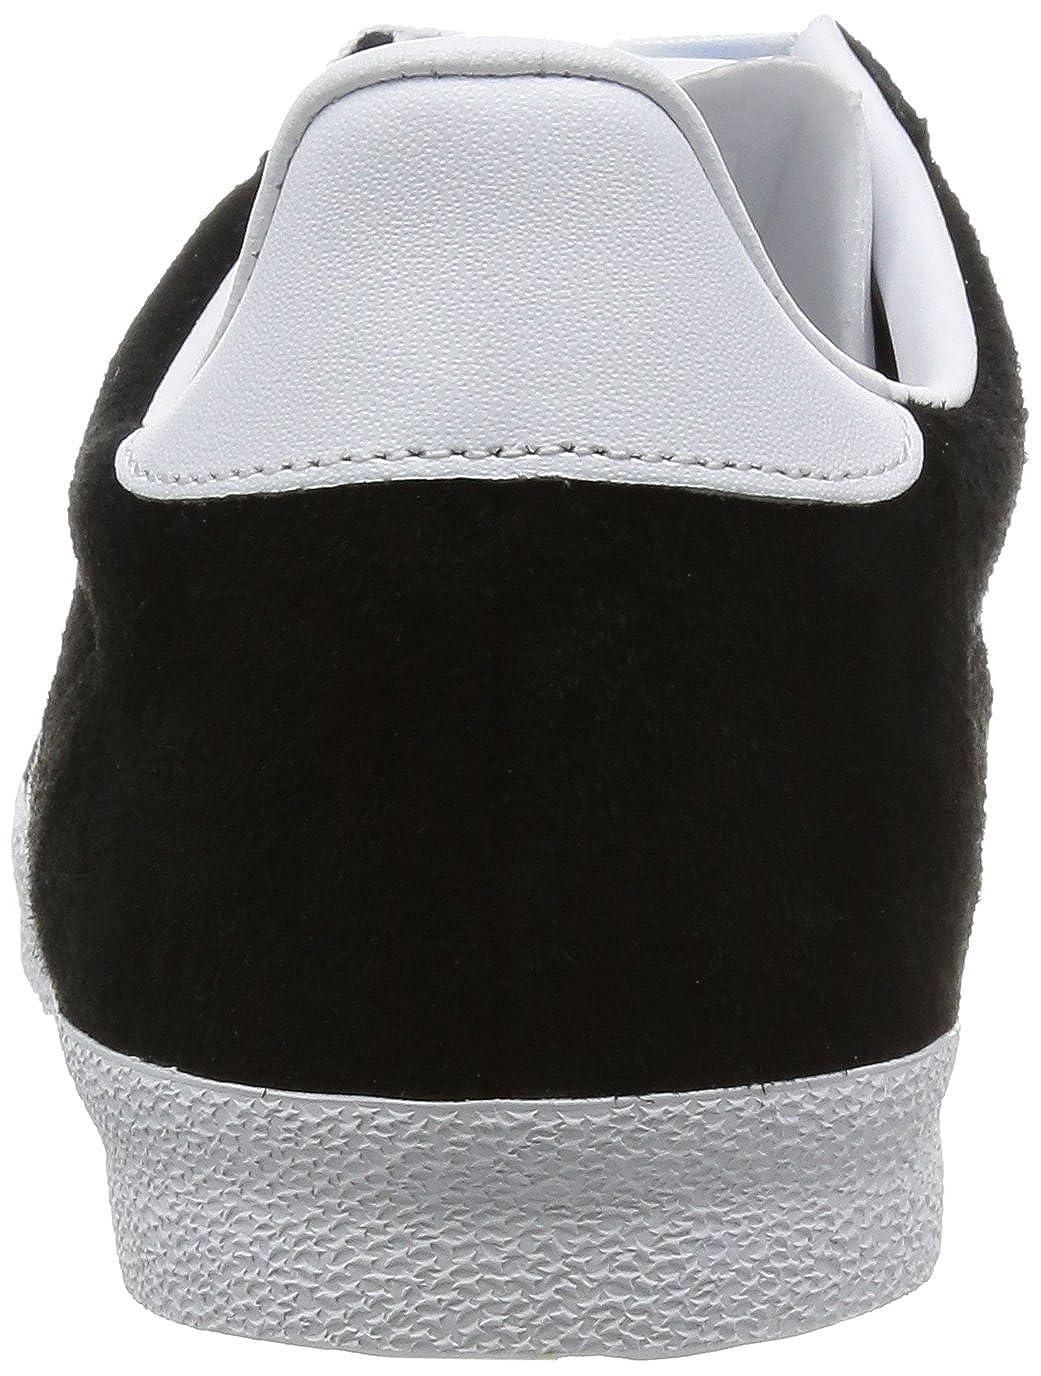 Adidas Gazelle Og Men S Trainers Amazon Co Uk Shoes Bags